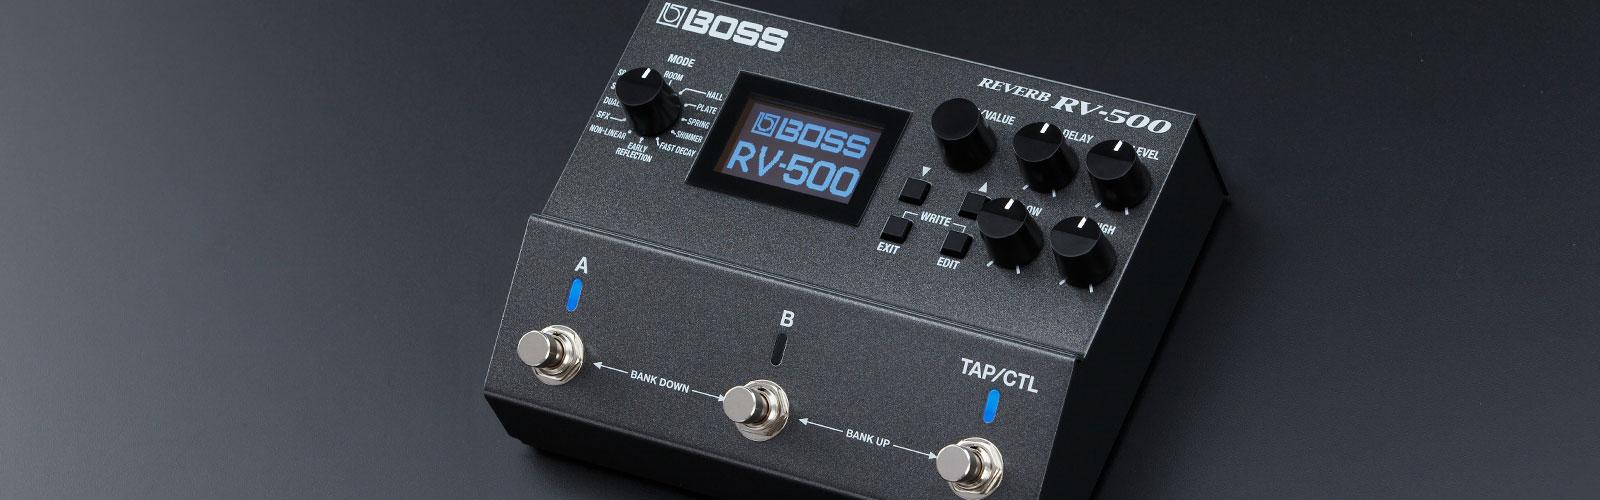 RV-500